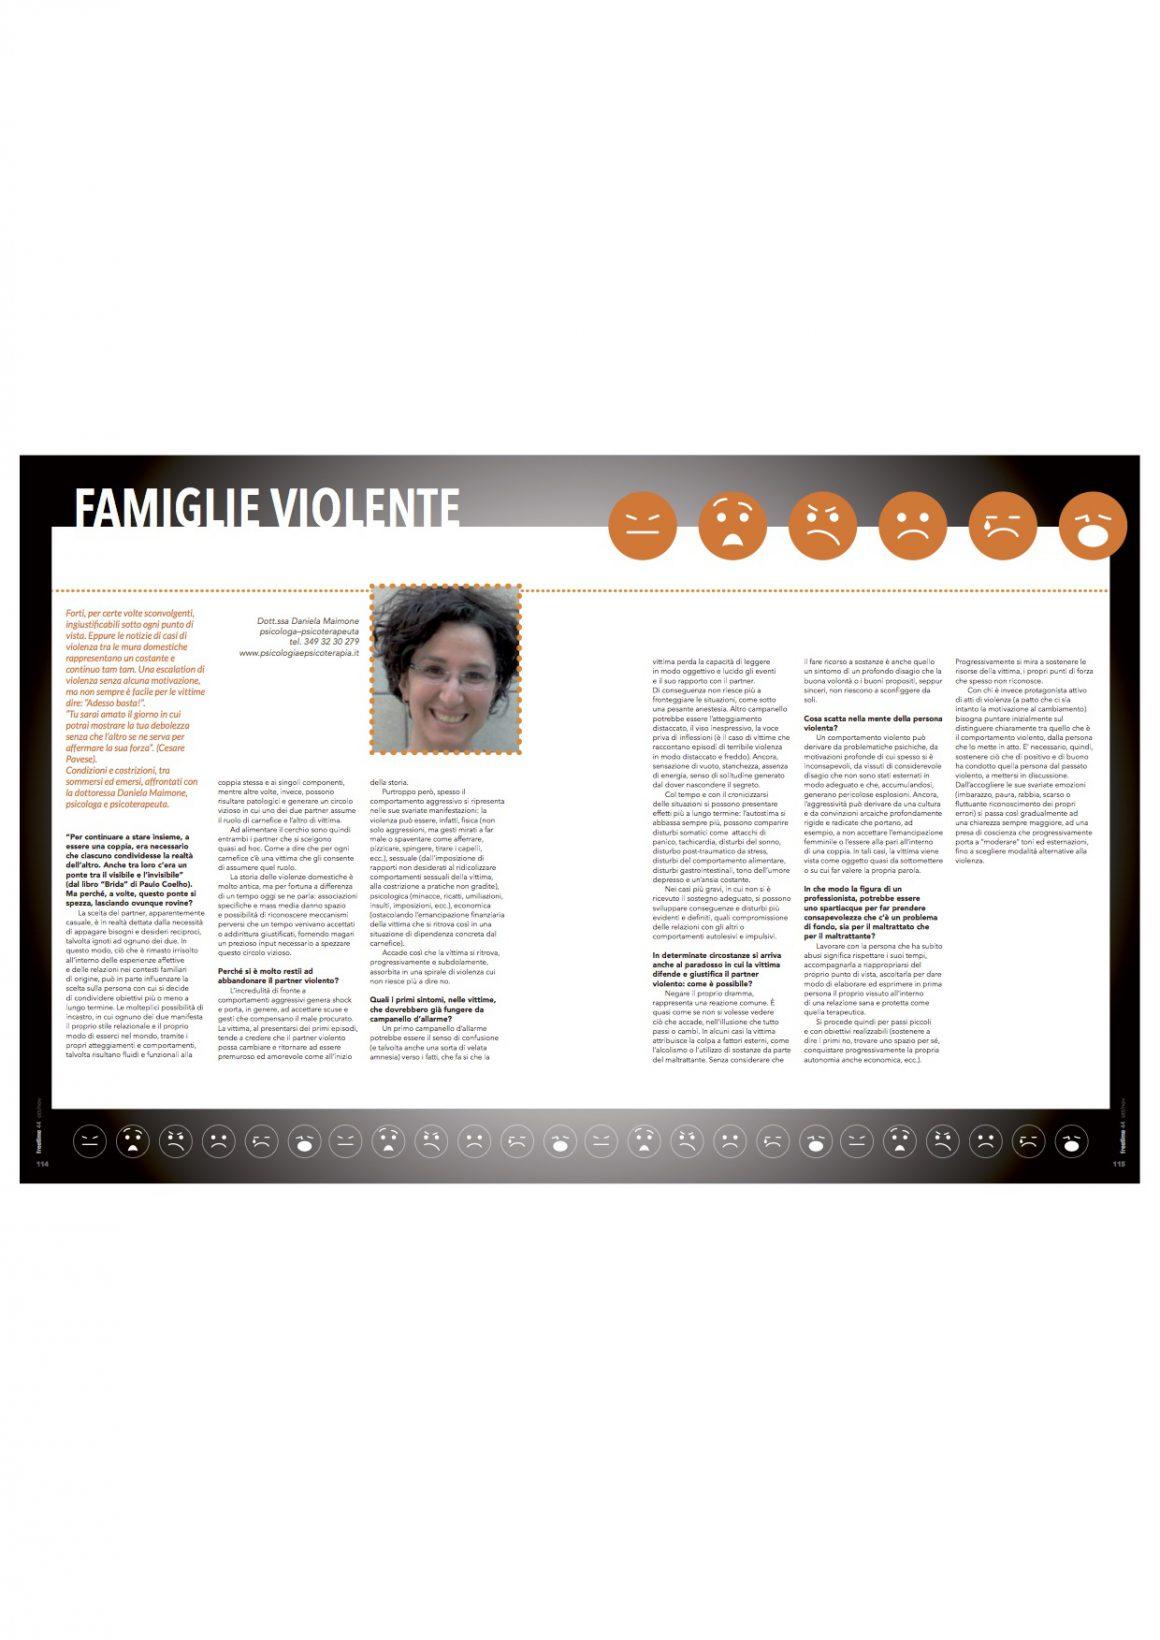 Famiglie violente